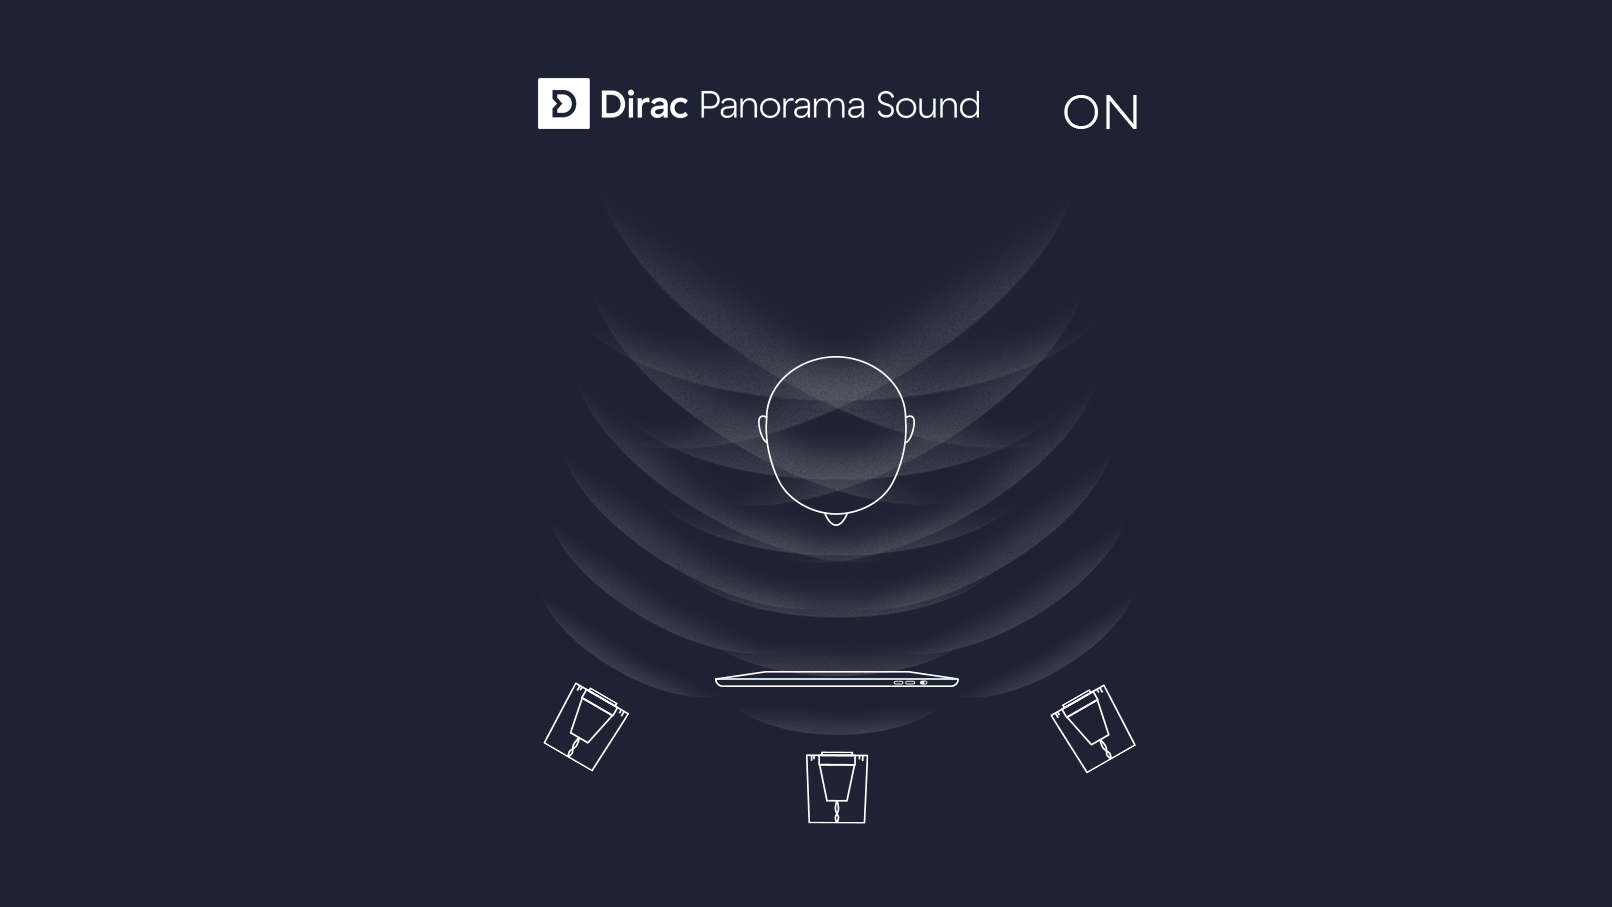 Dirac Panorama Sound on.png